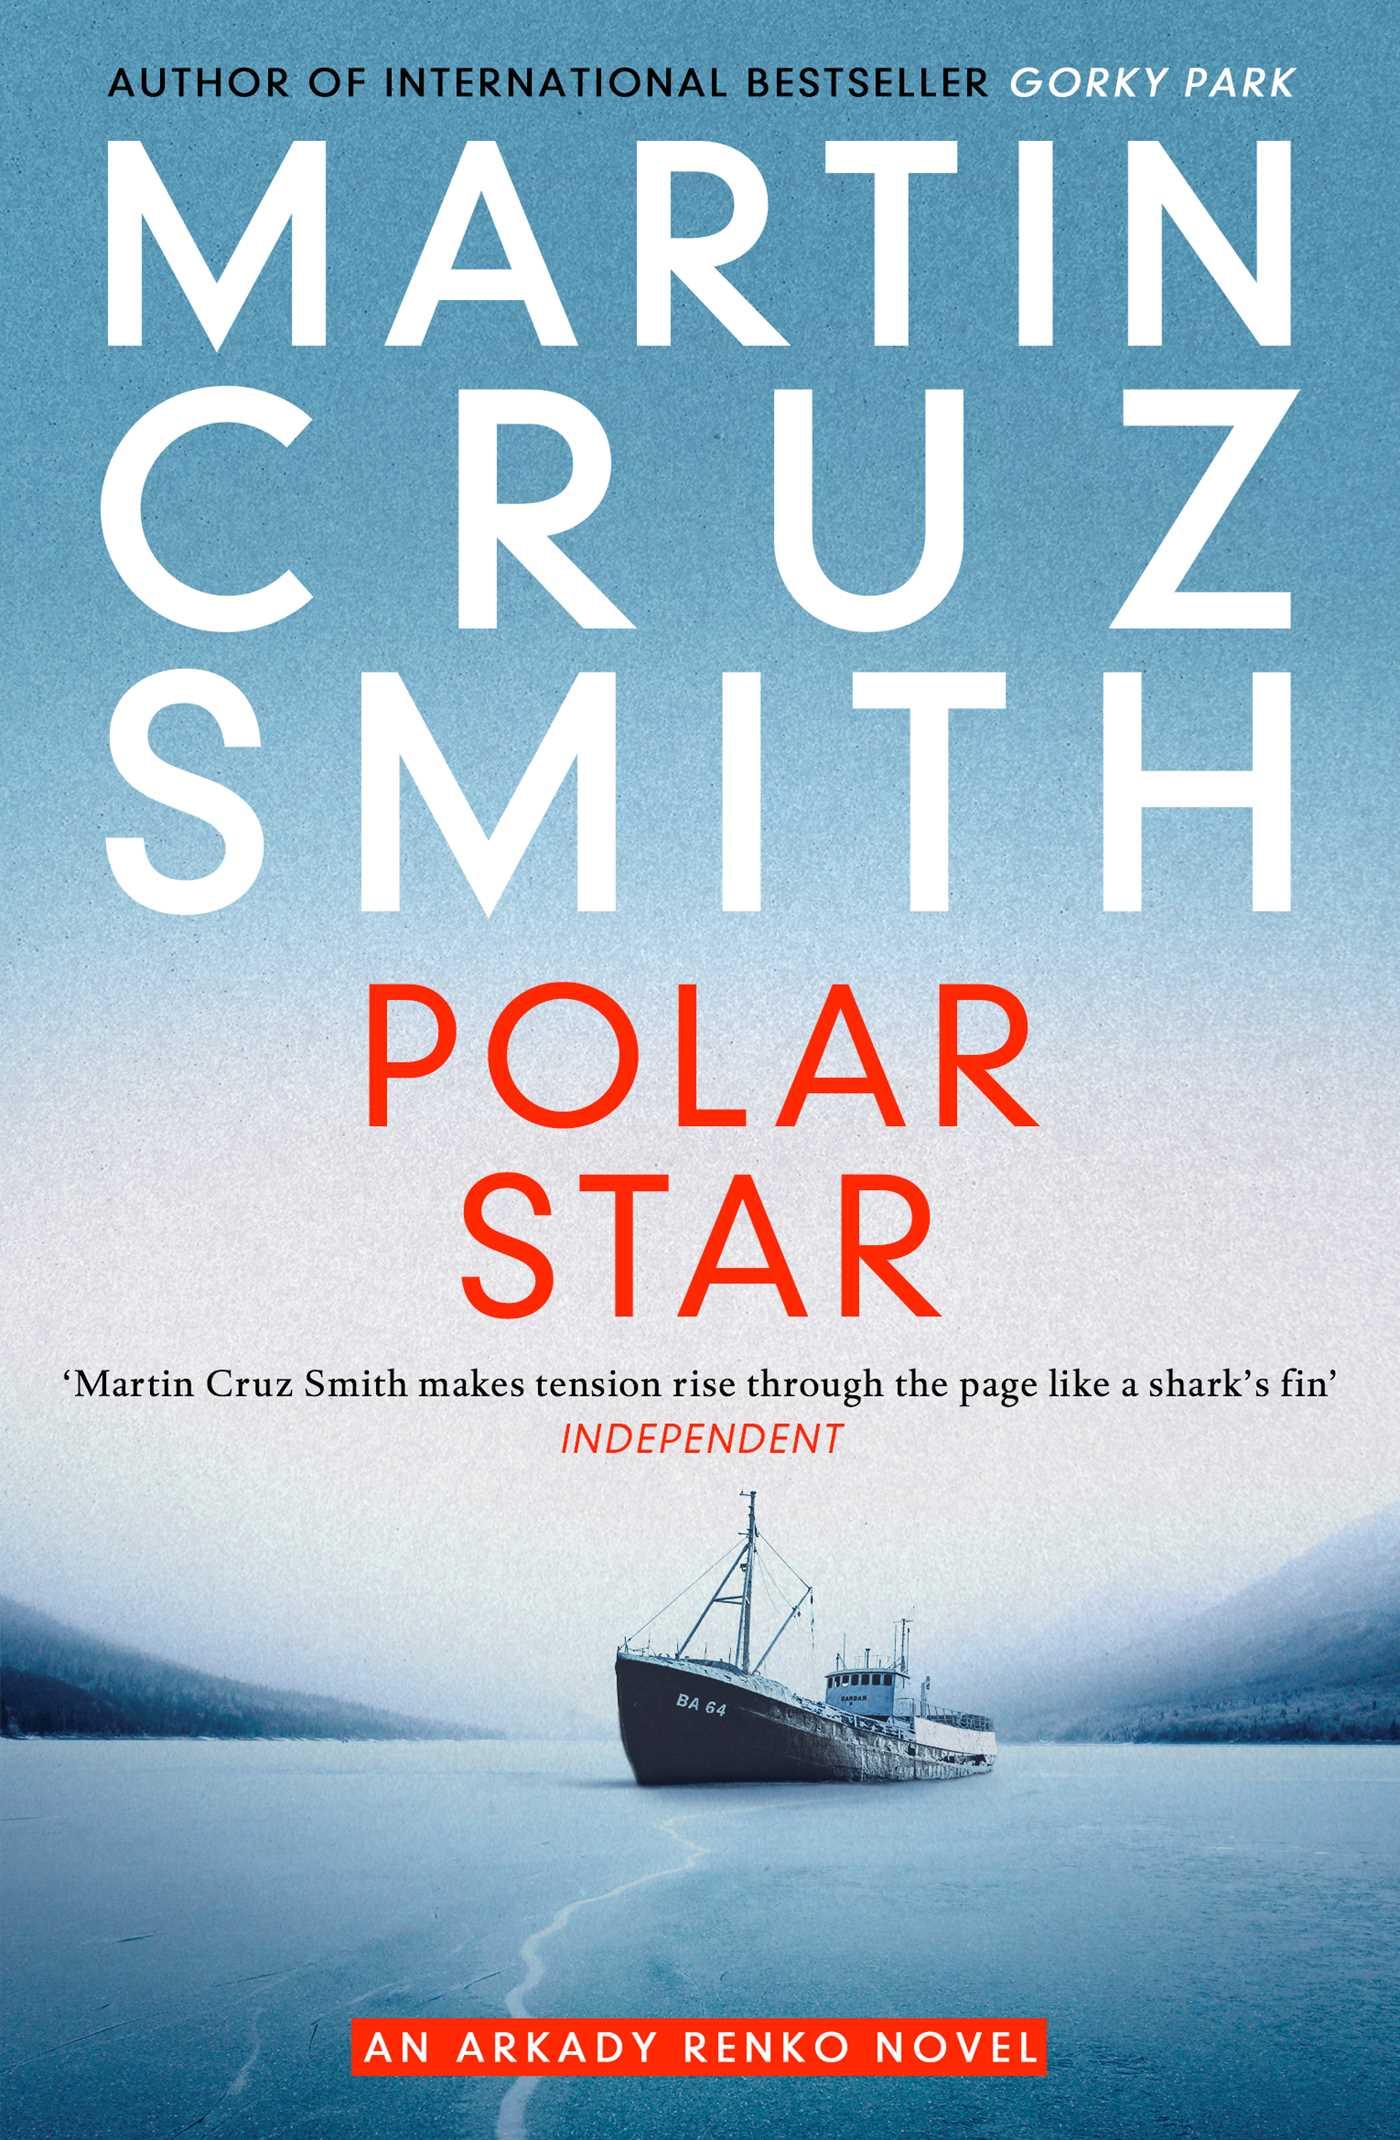 Polar star 9781849838245 hr